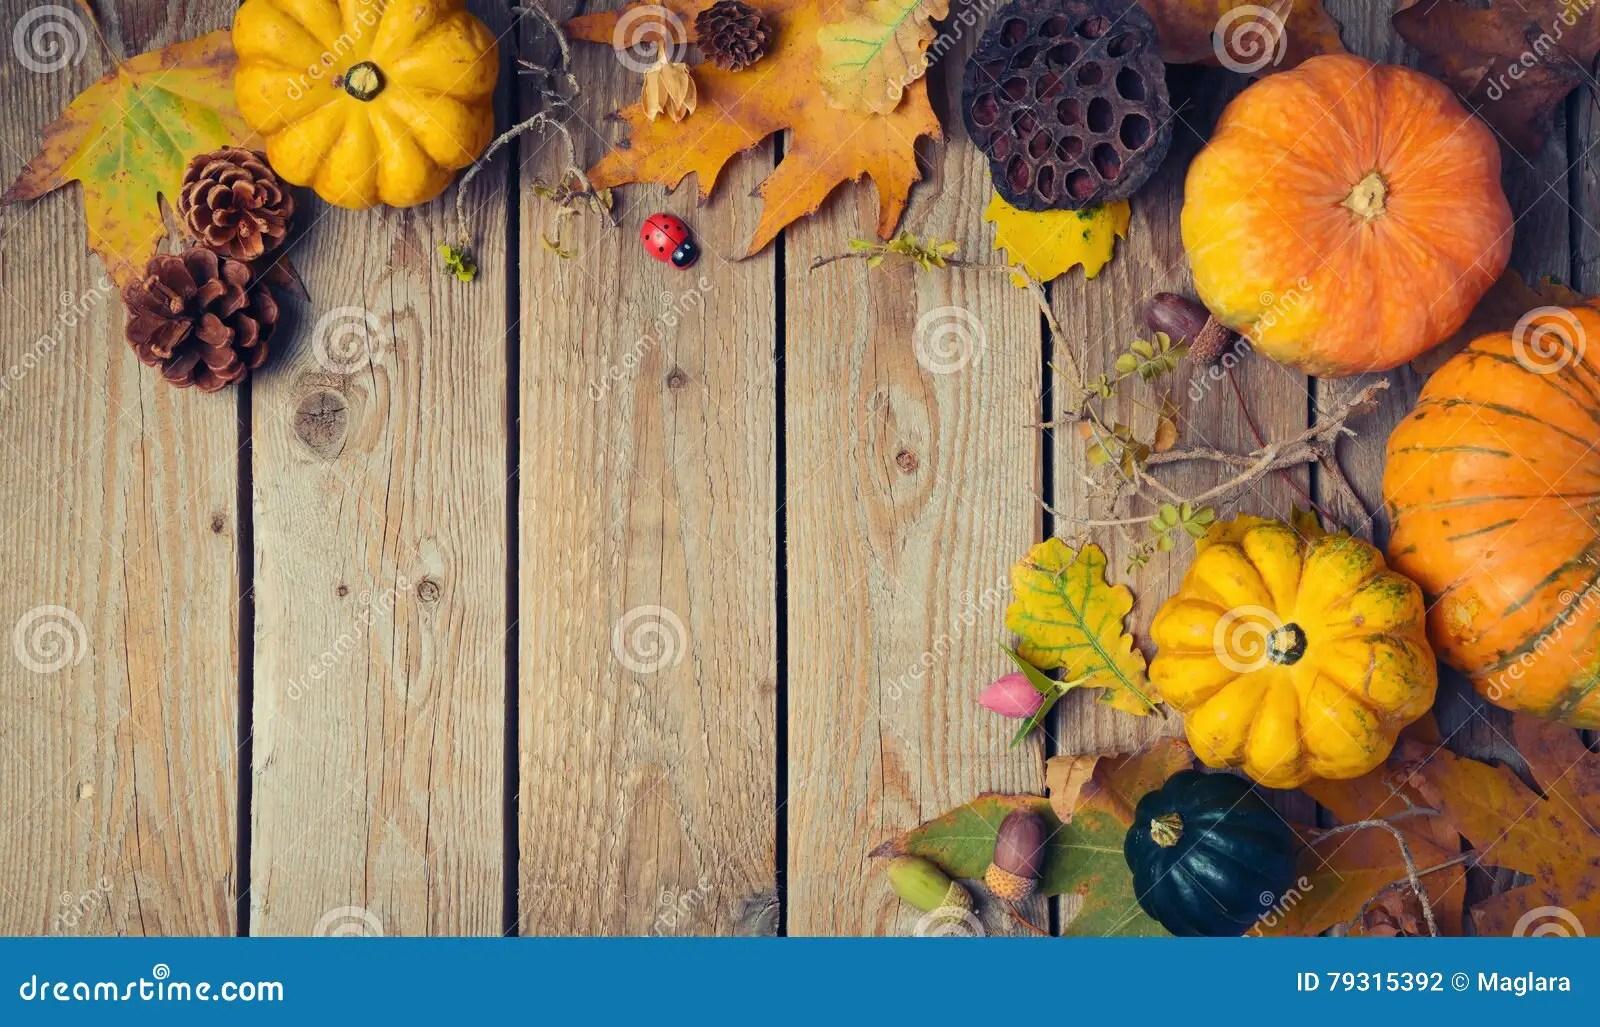 Free Fall Download Wallpaper Thanksgiving Dinner Background Autumn Pumpkin And Fall